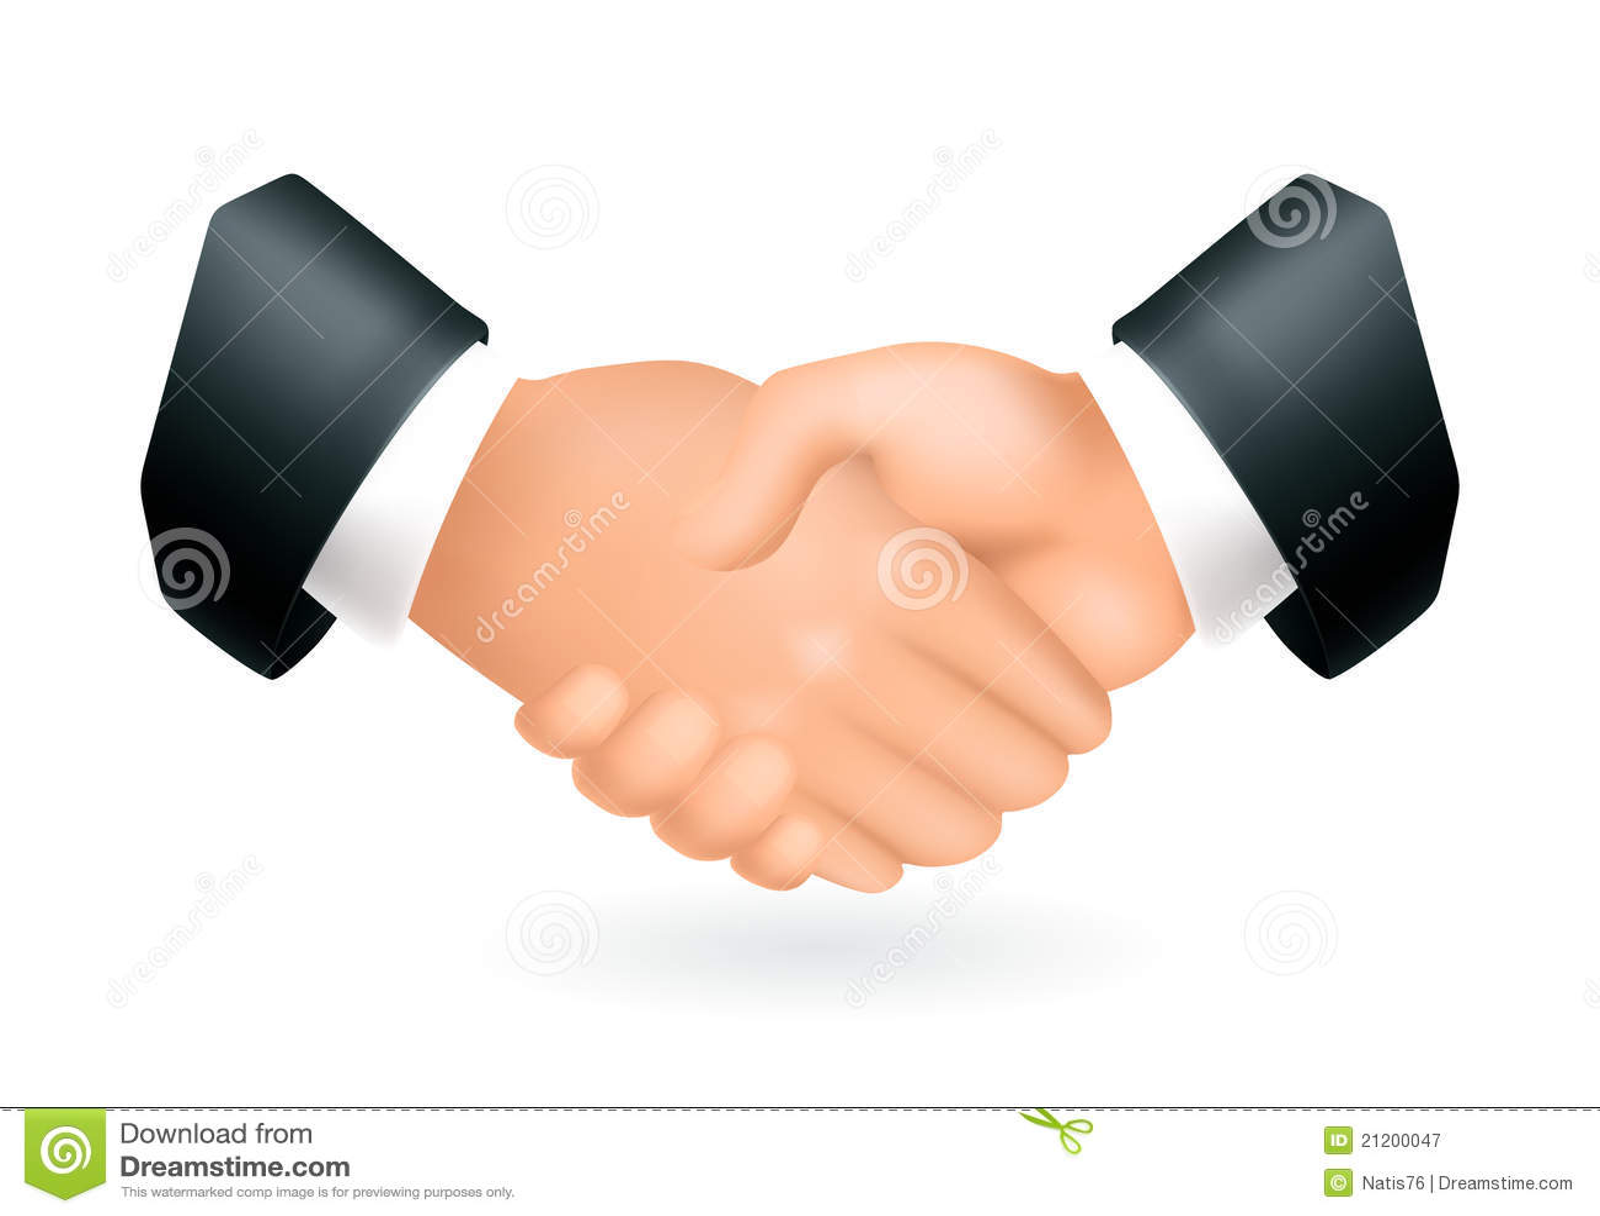 Handshake, icon stock vector  Illustration of business - 21200047